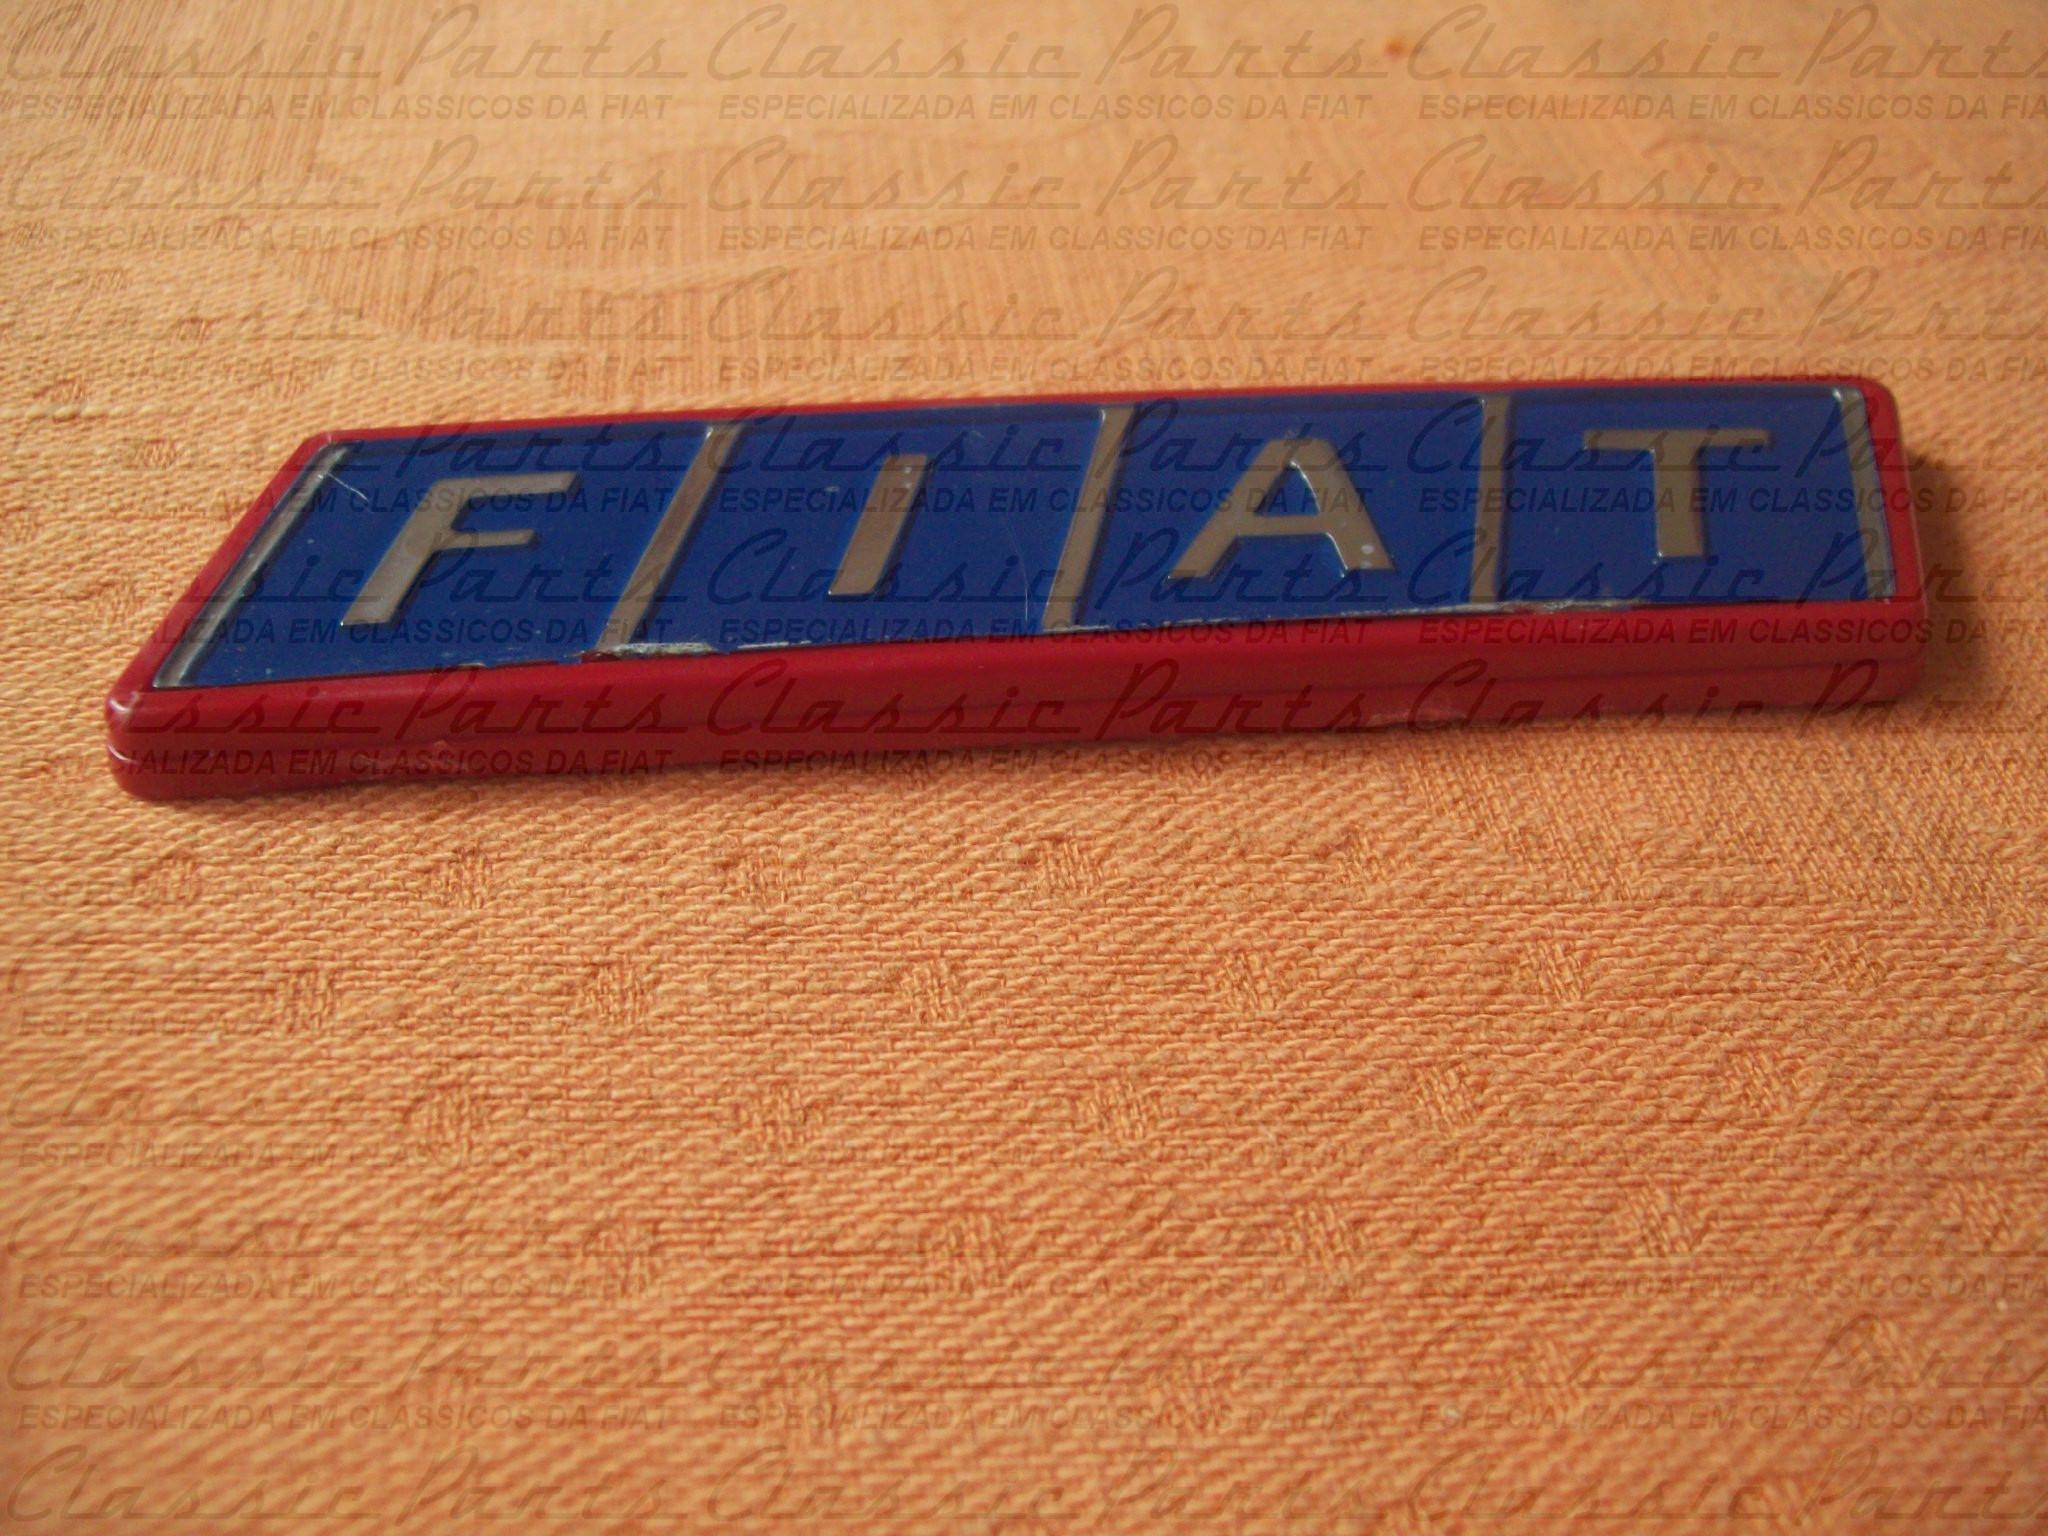 "EMBLEMA P MALA MOLD VERMELHA ""FIAT"" FAMILIA FIAT 83/91"